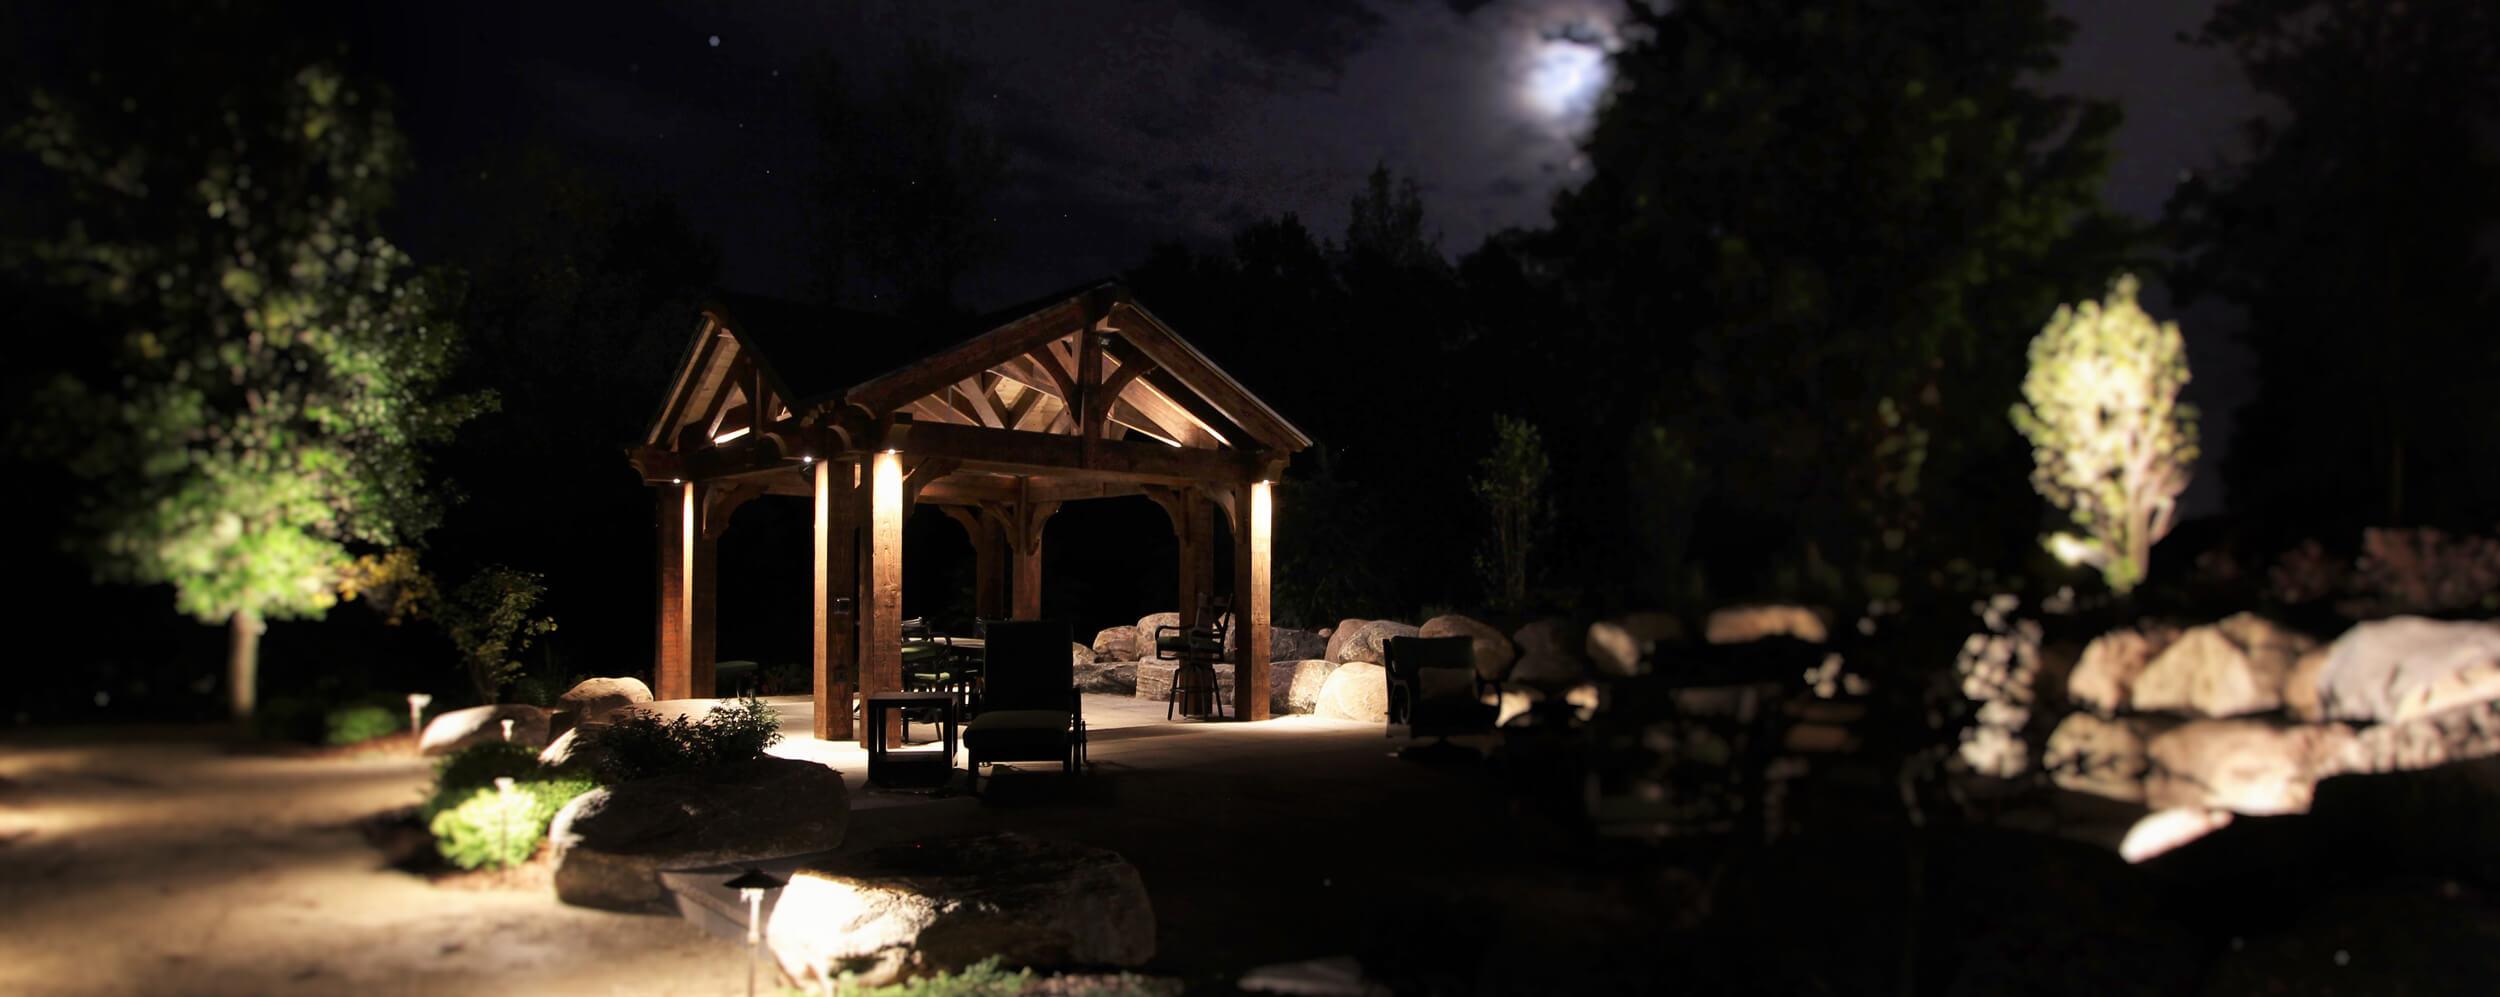 Outdoor Landscape Lighting Project